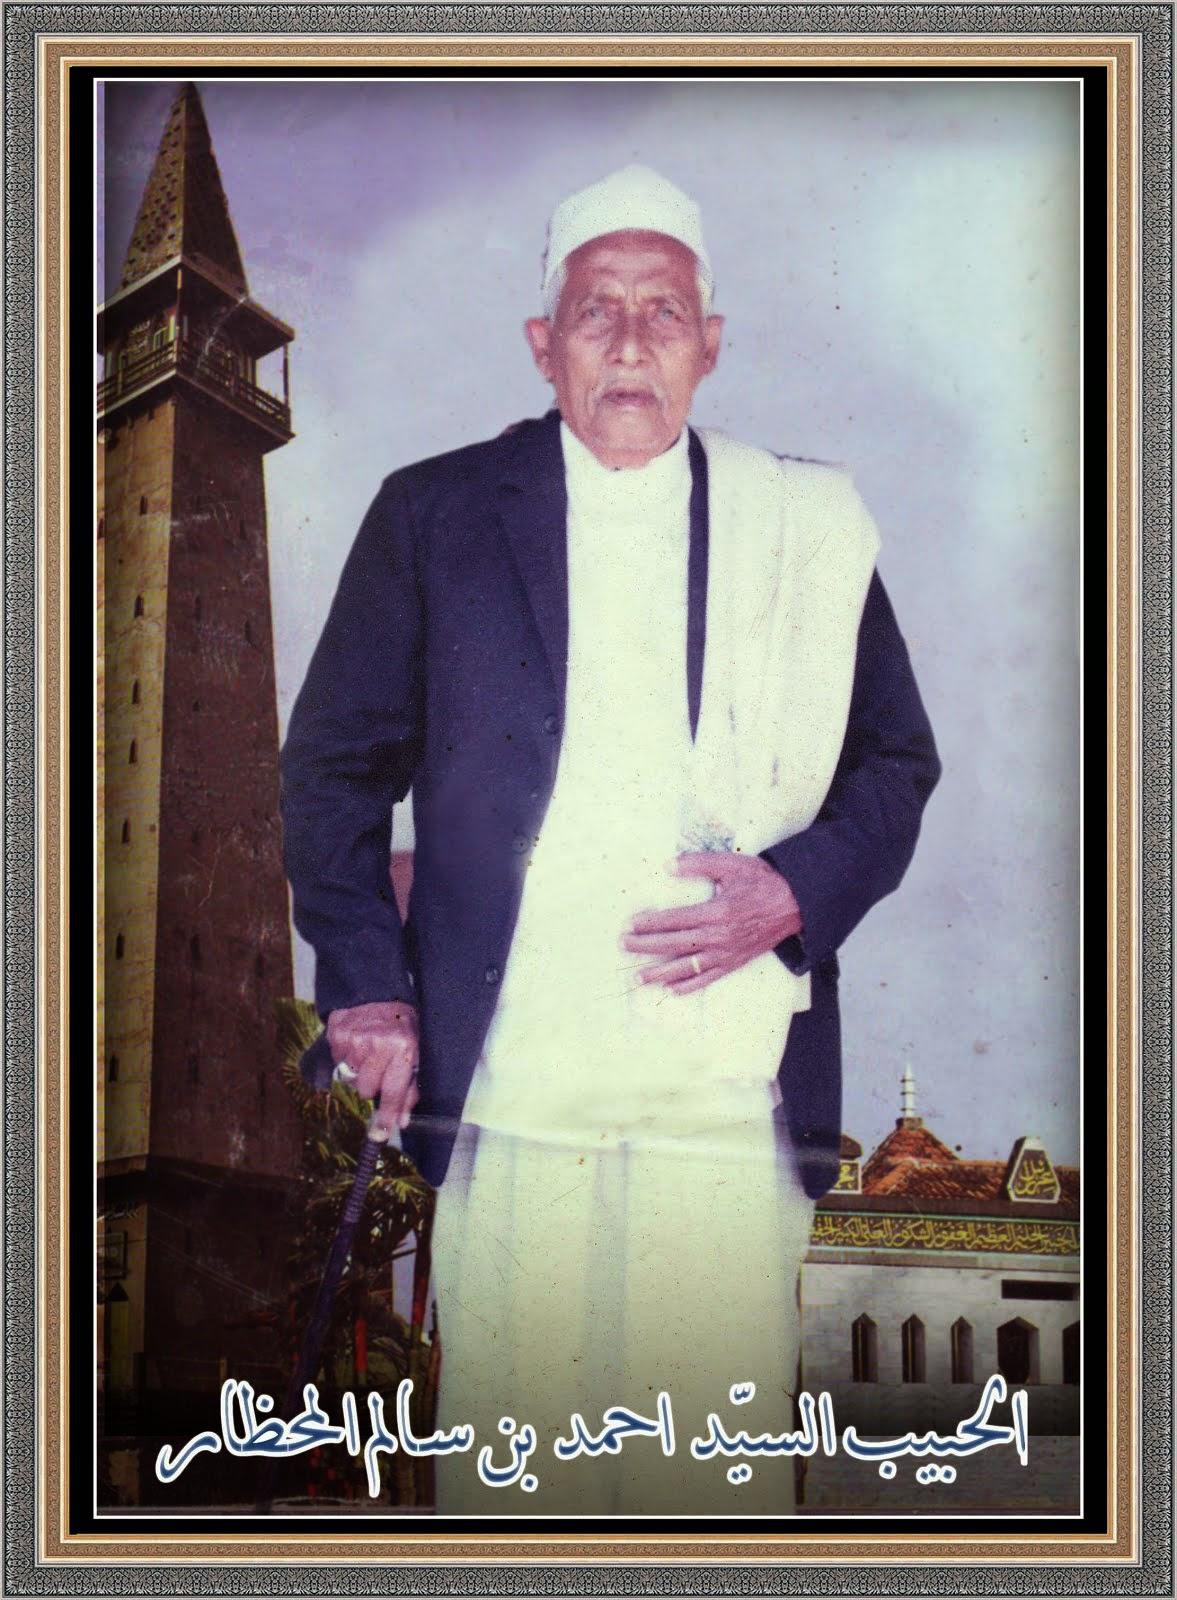 HABIB SAYYID AHMAD BIN SALIM AL MUHDLOR